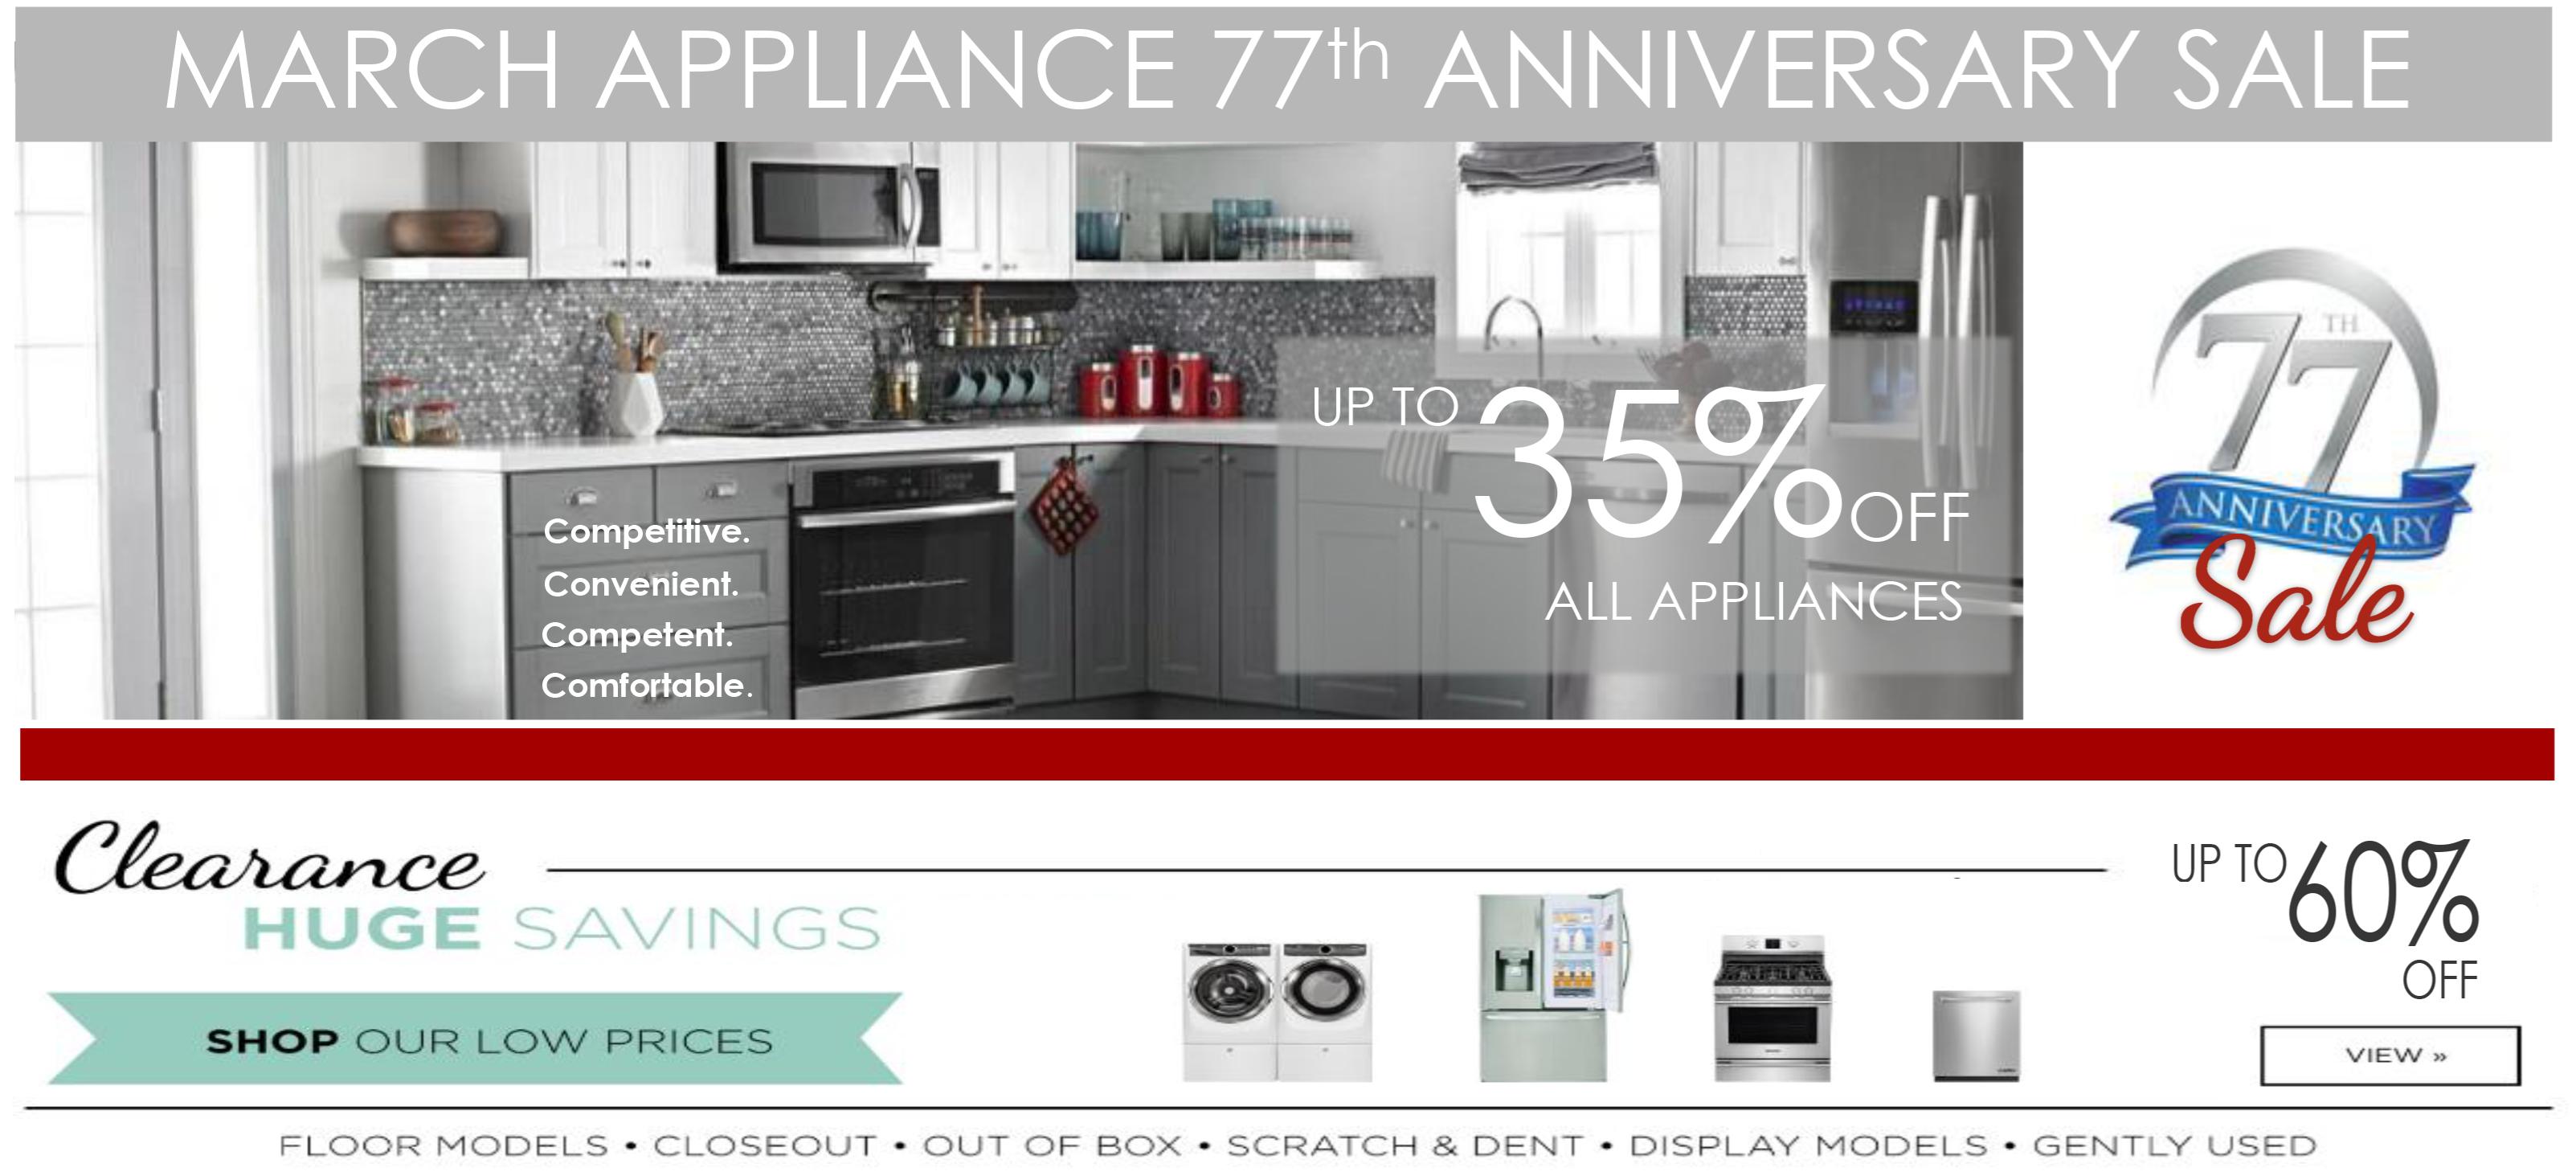 Huge Savings on Appliances!